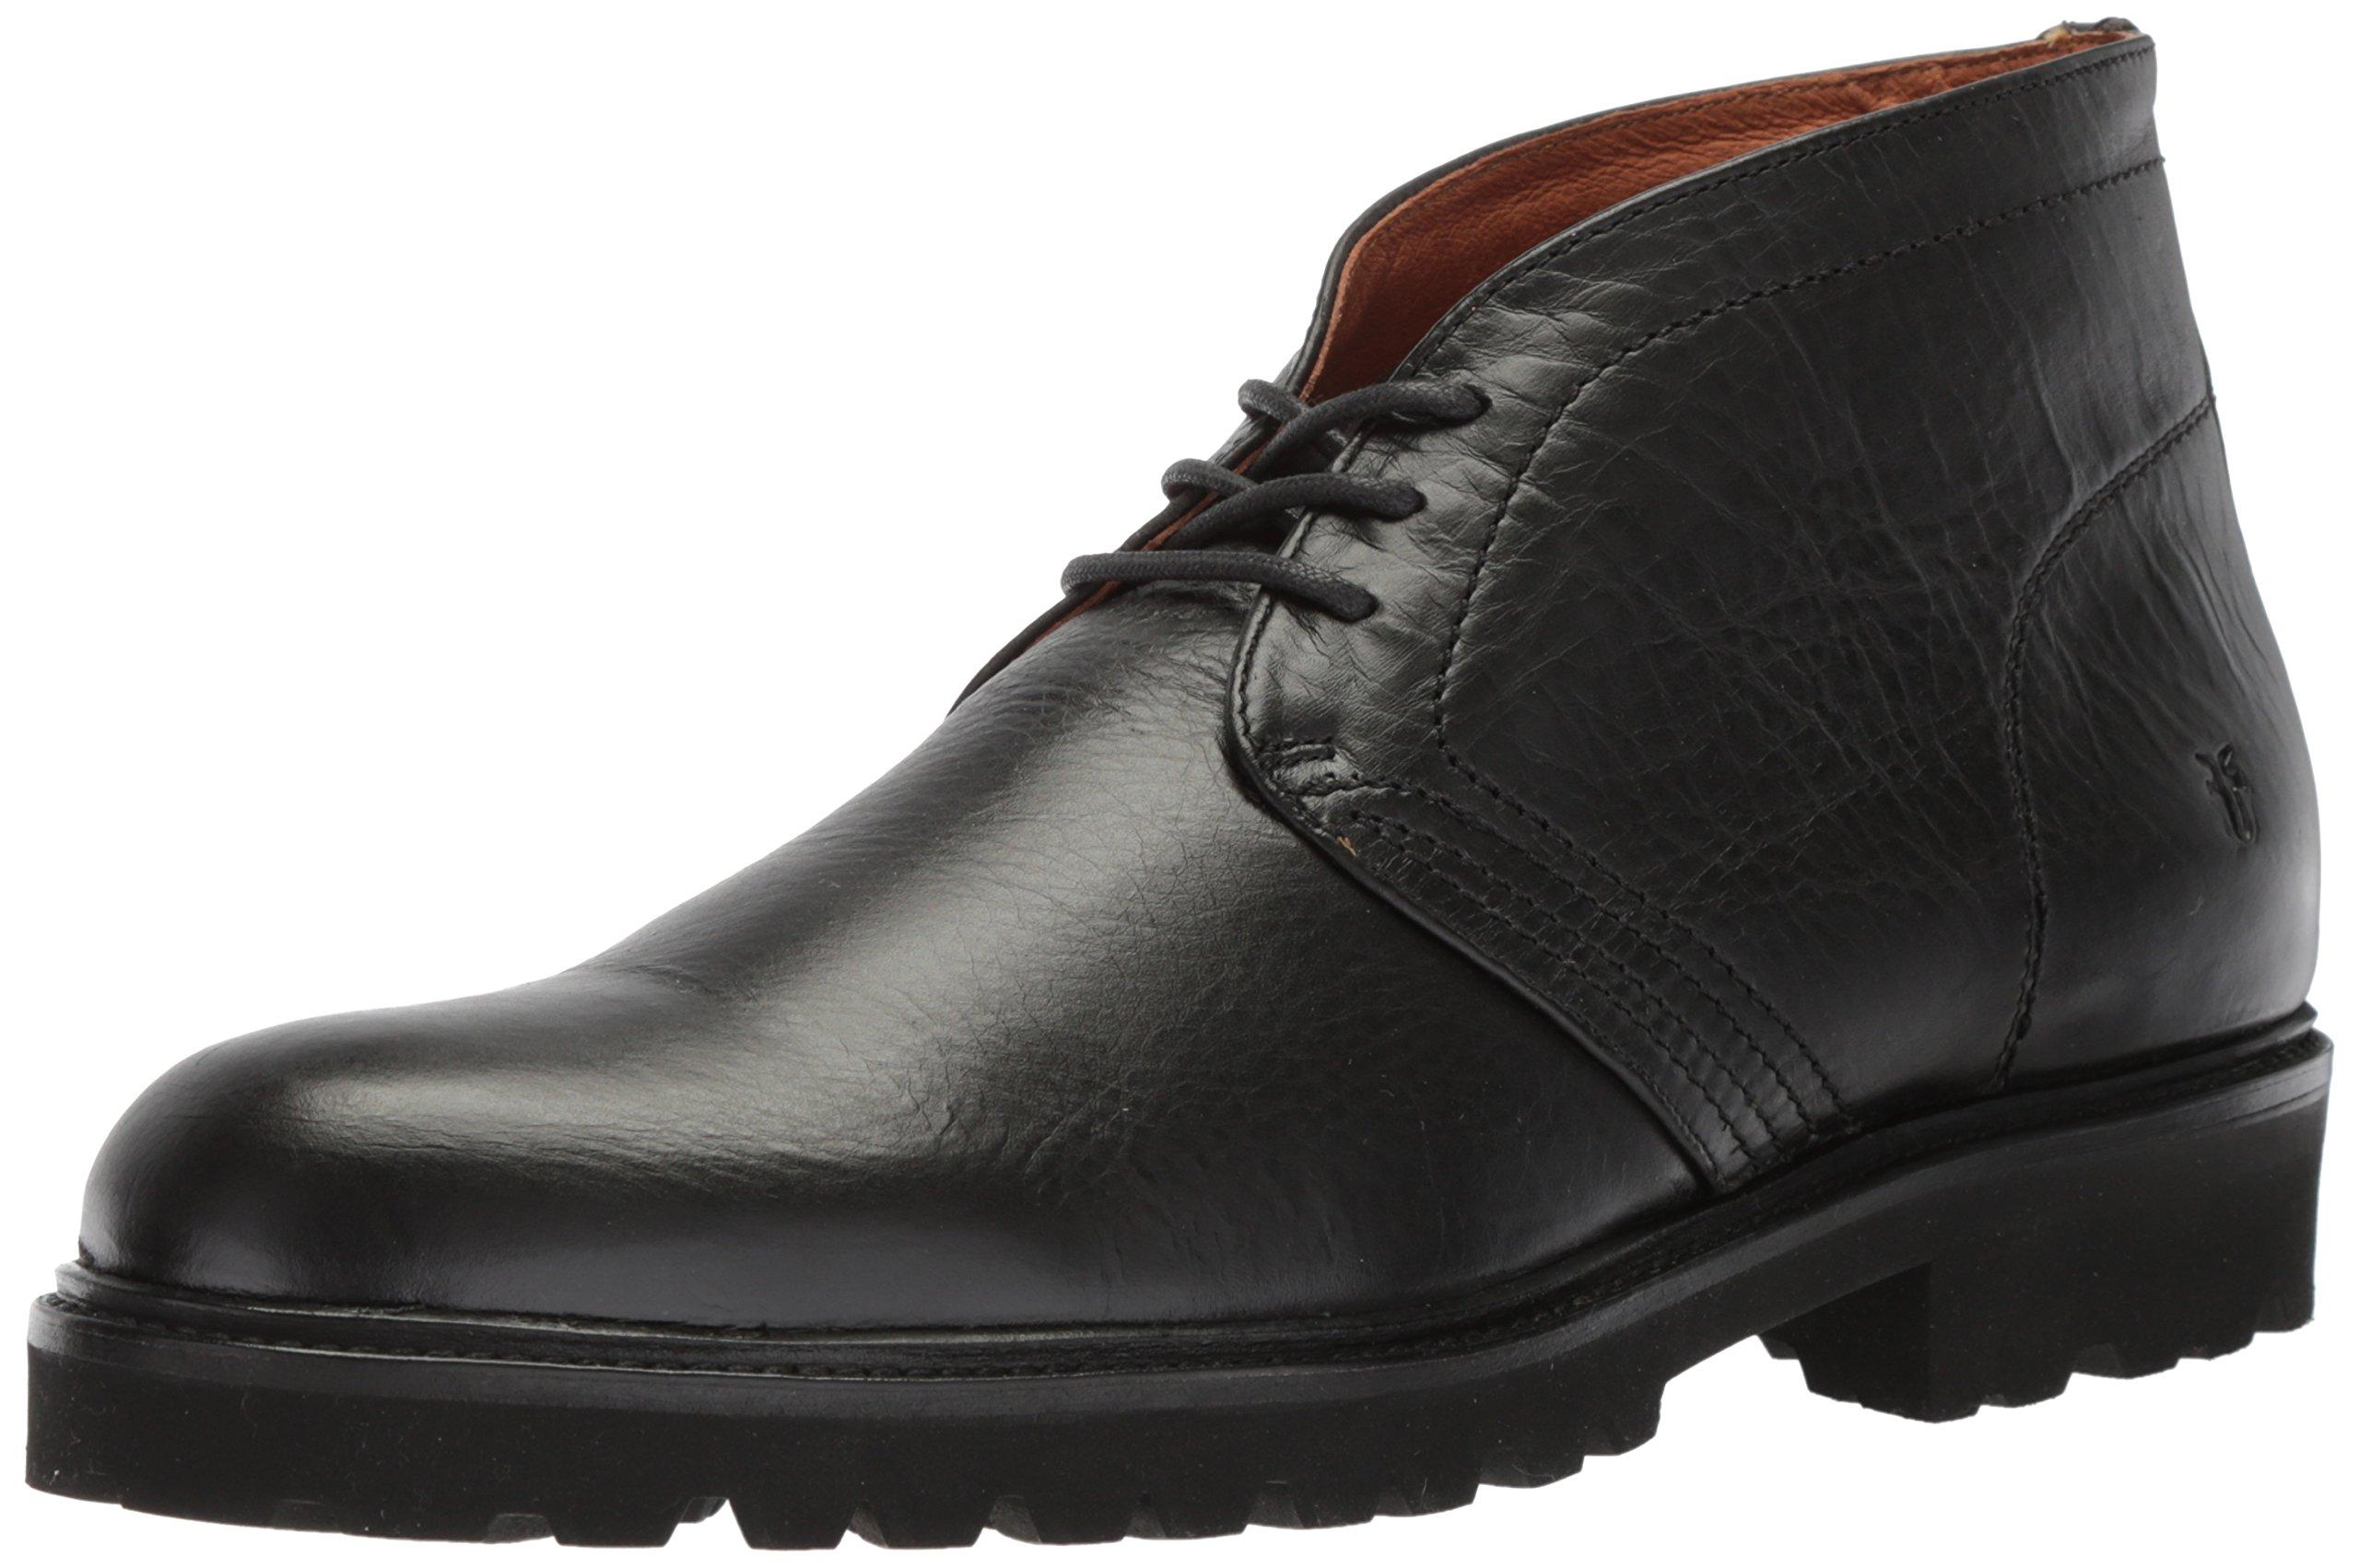 FRYE Men's Edwin Chukka Boot, Black, 11 D US